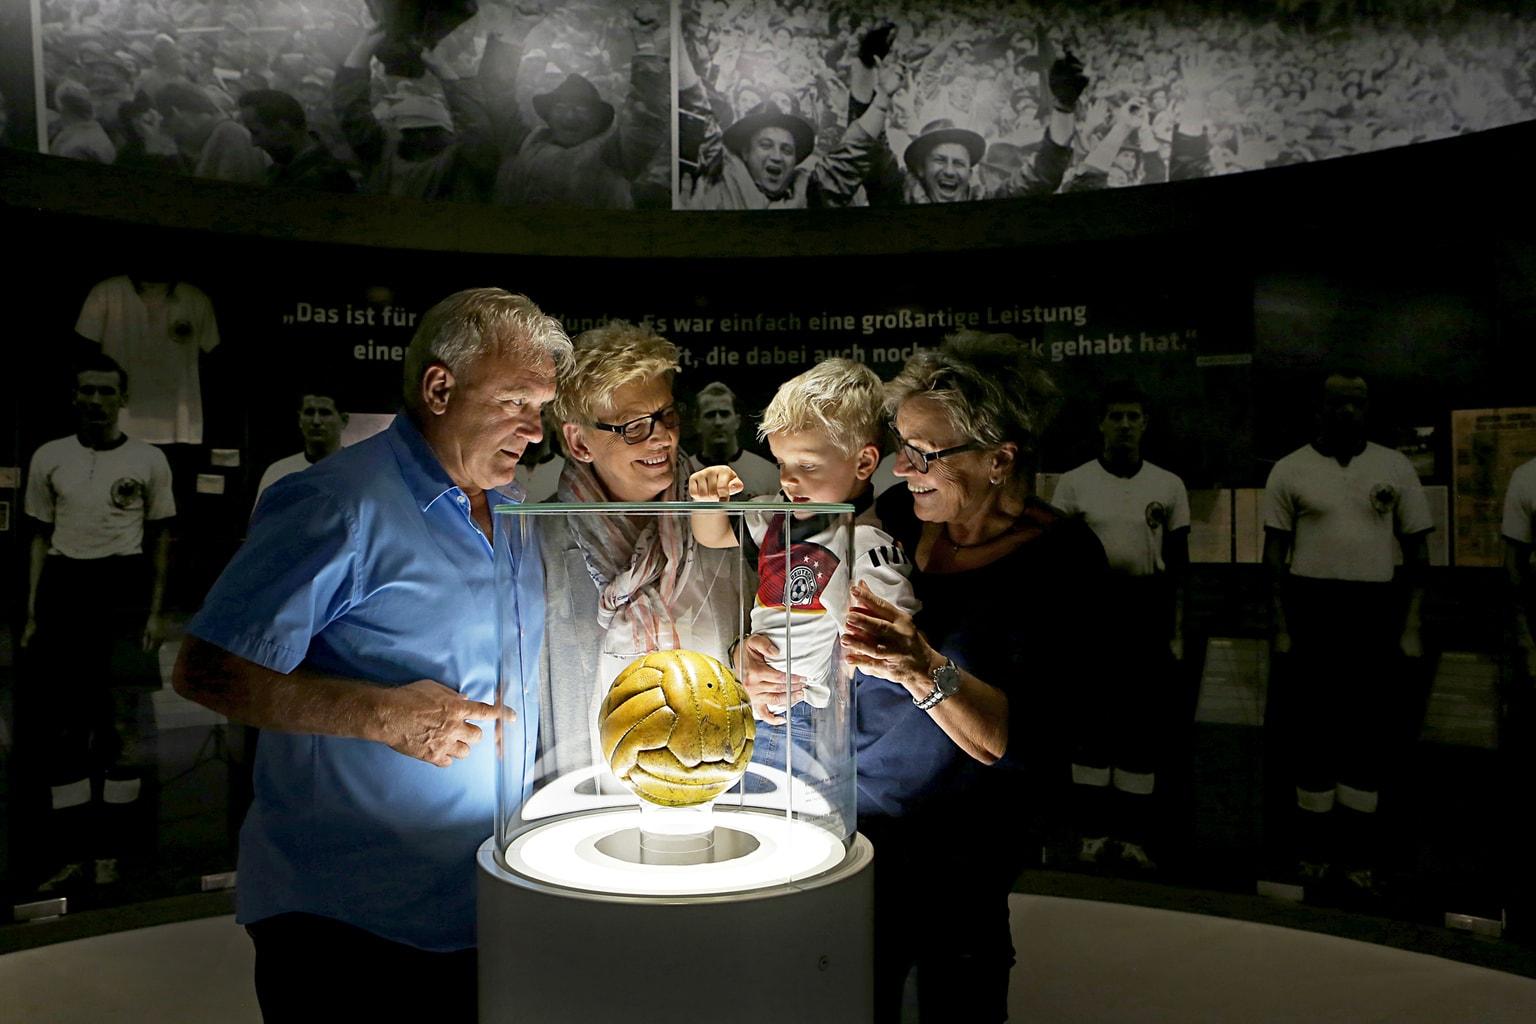 Voetbal van het wonder van Bern in het Duits voetbalmuseum